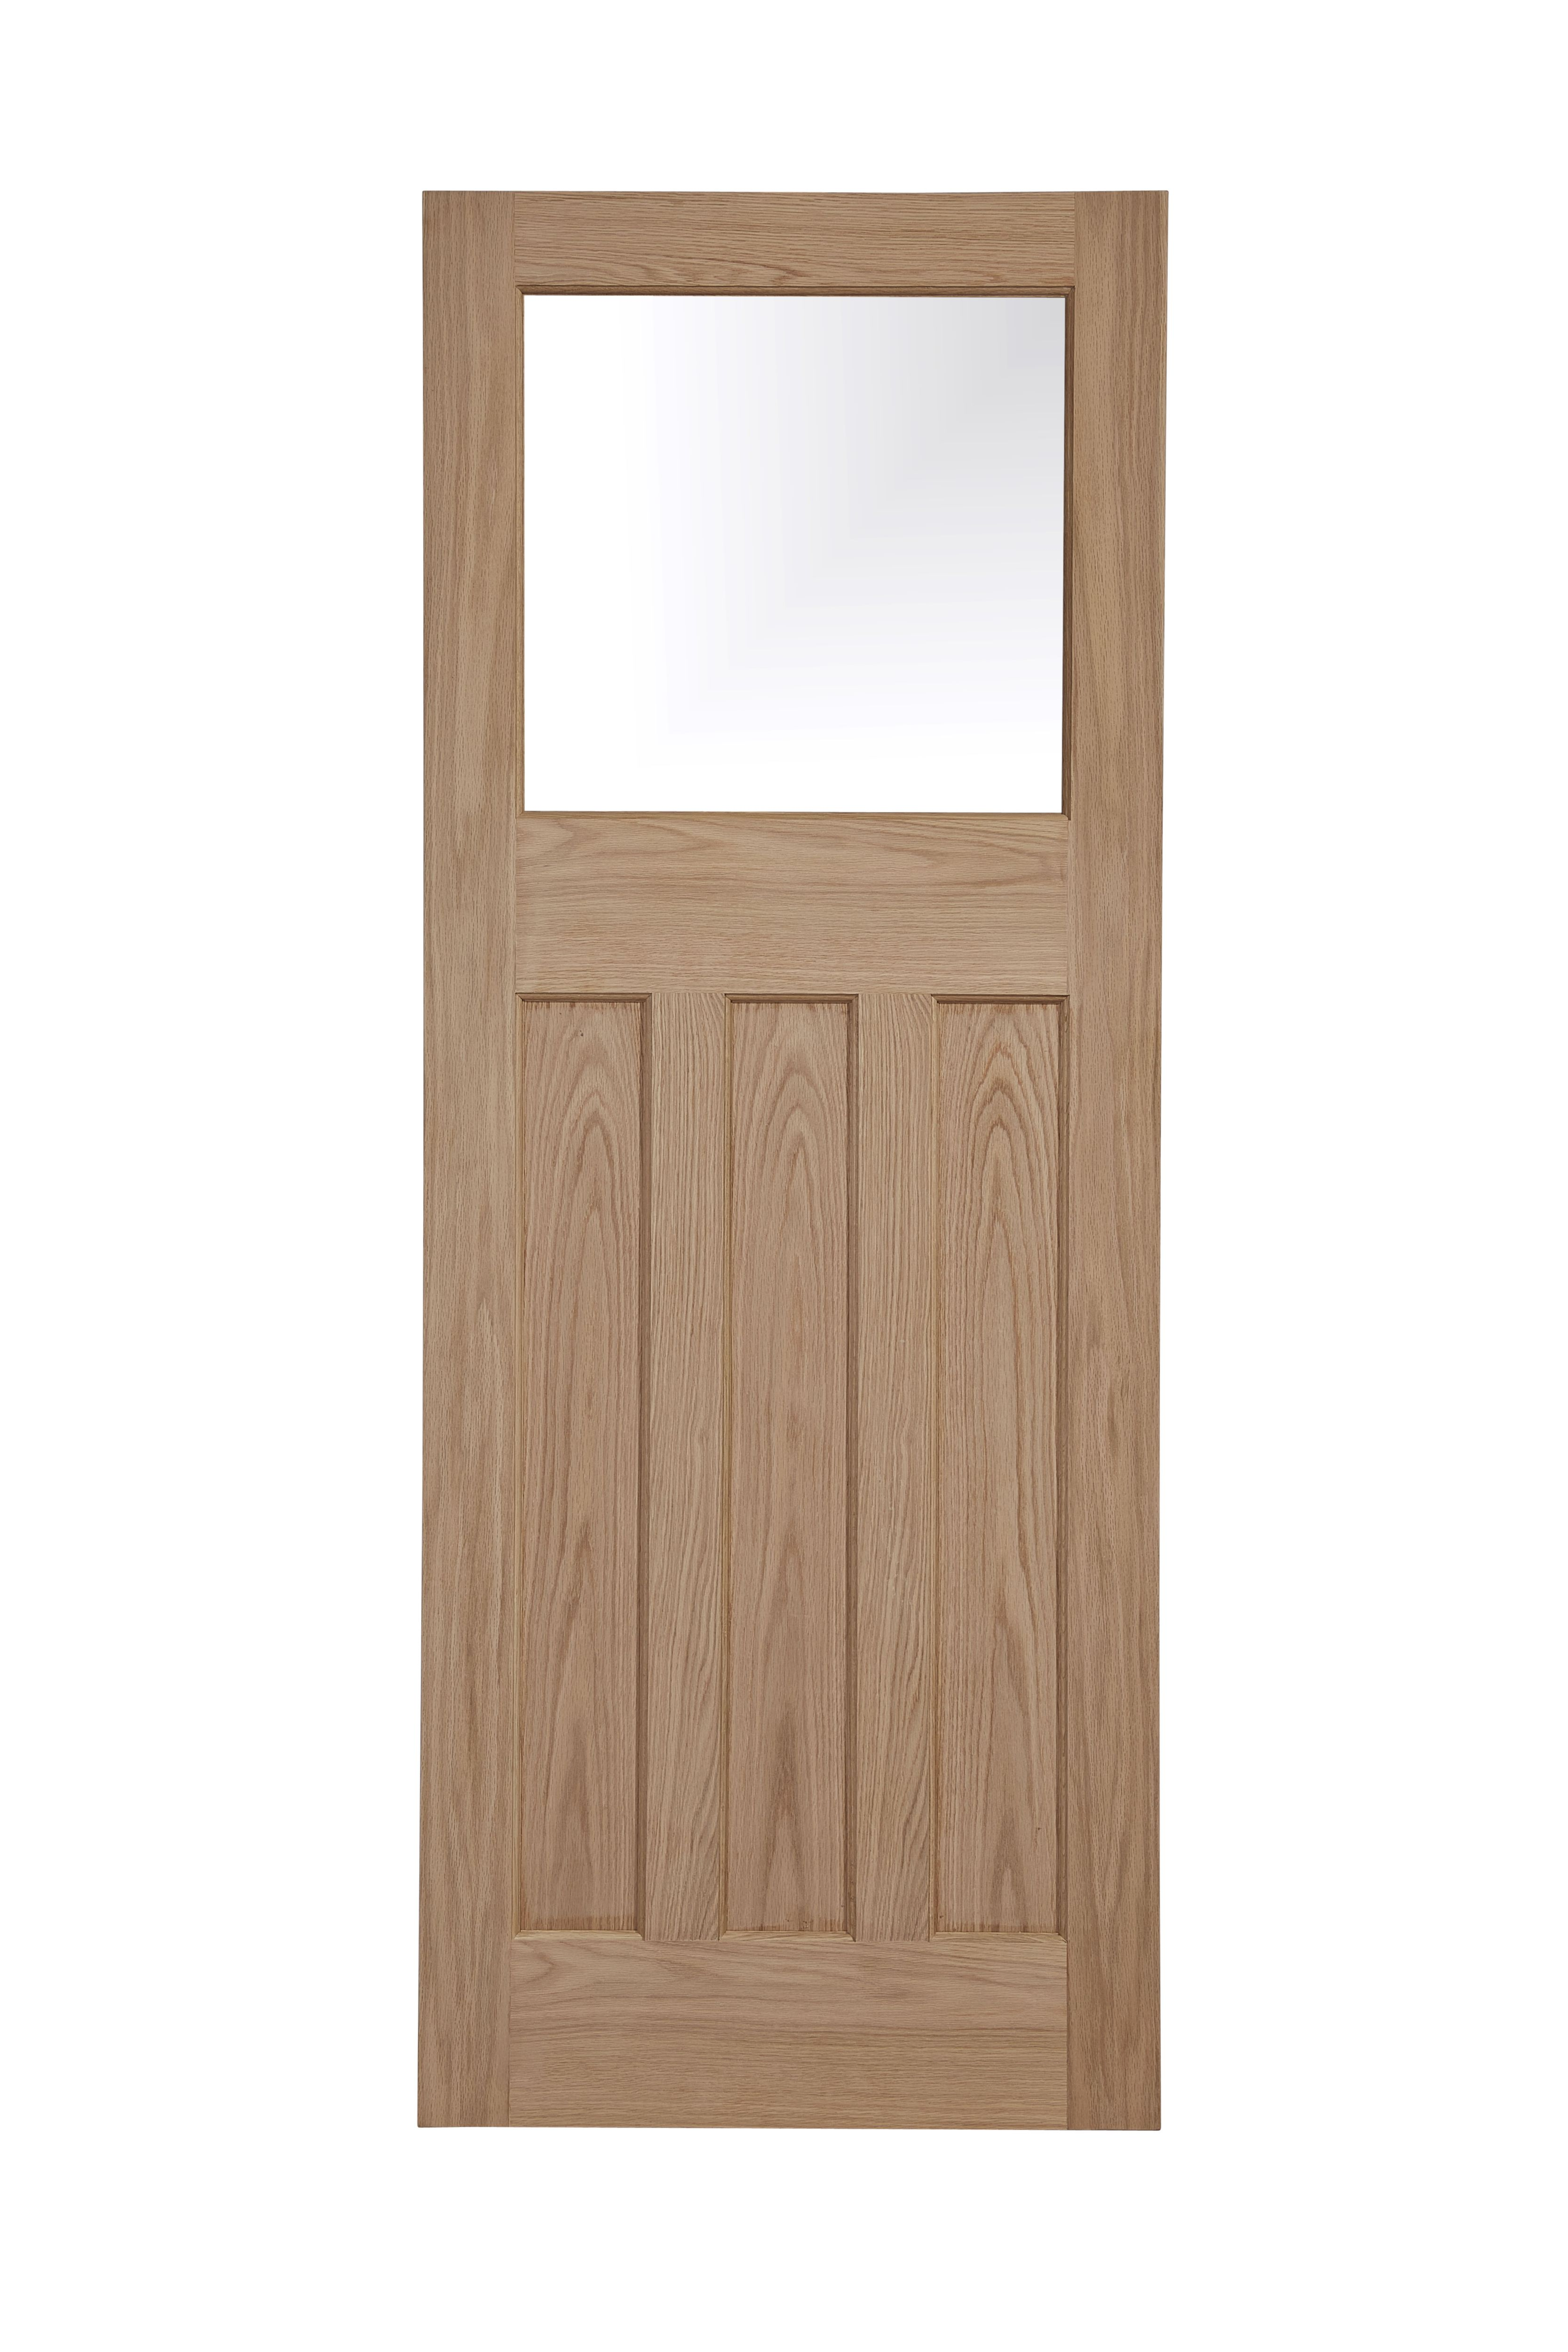 Traditional panelled oak veneer glazed internal door h1981mm w traditional panelled oak veneer glazed internal door h1981mm w762mm departments diy at bq planetlyrics Image collections